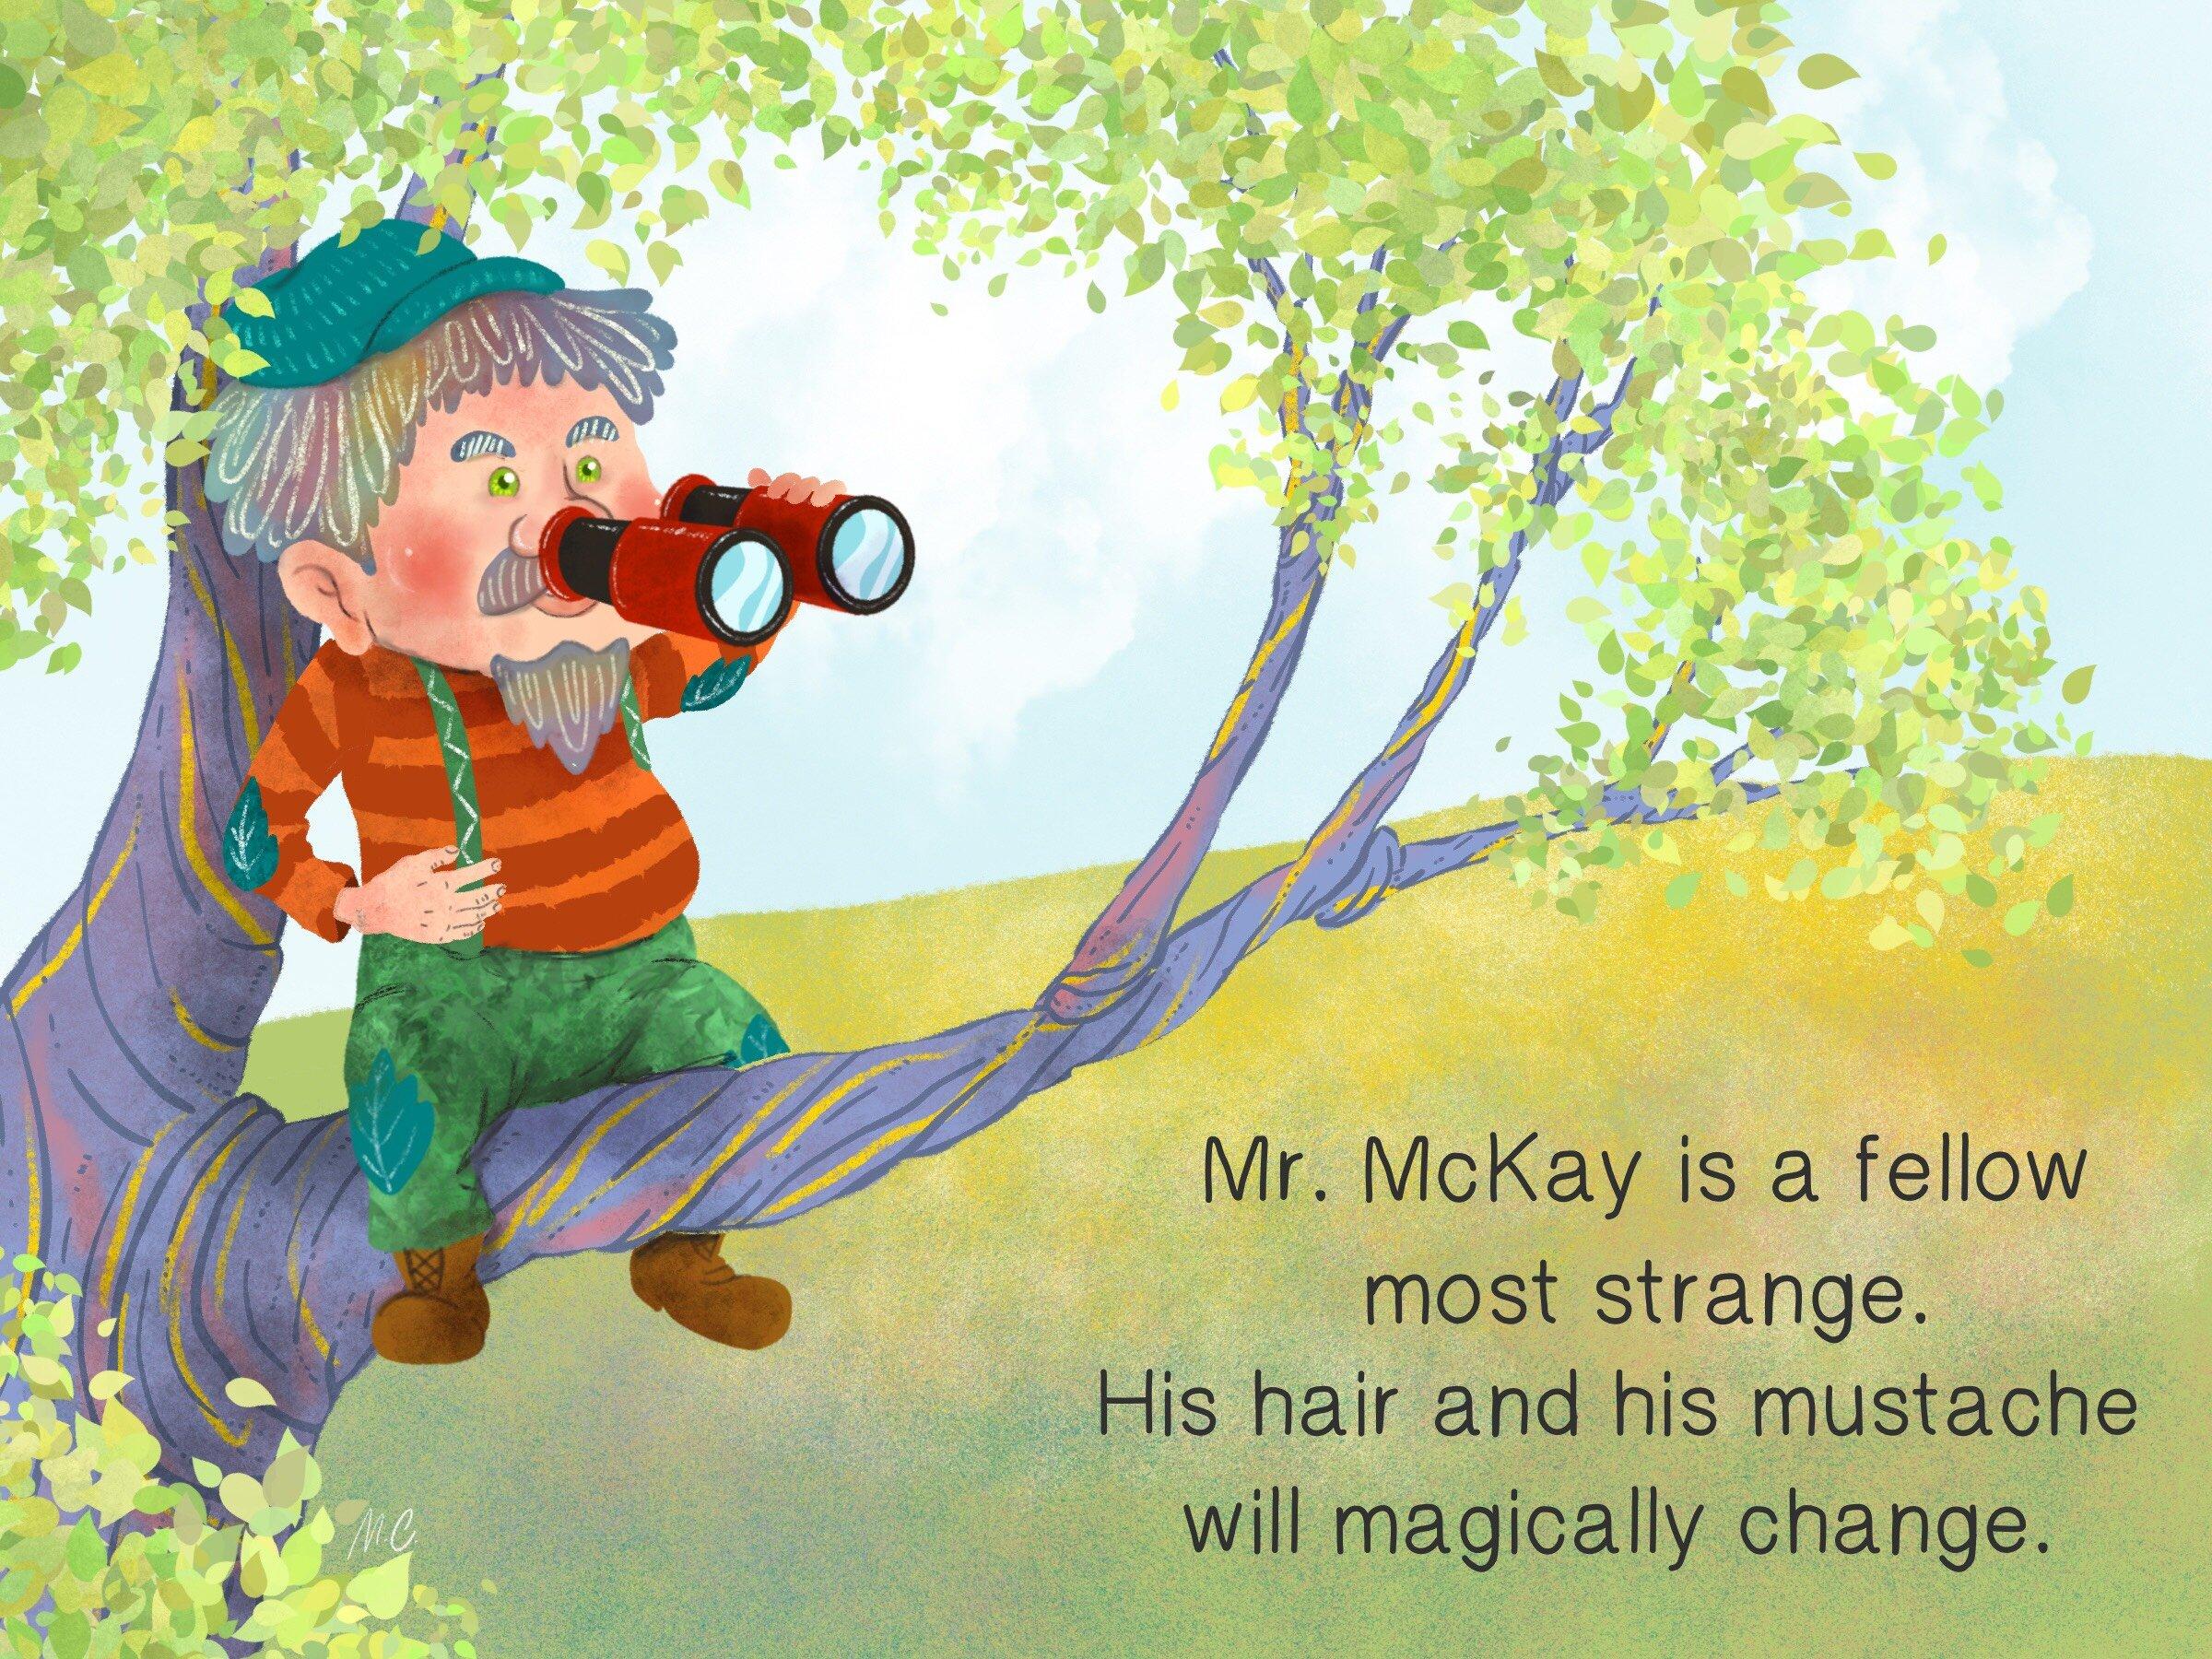 1 Mr.McKay sitting in a tree looking out with binoculars.jpg